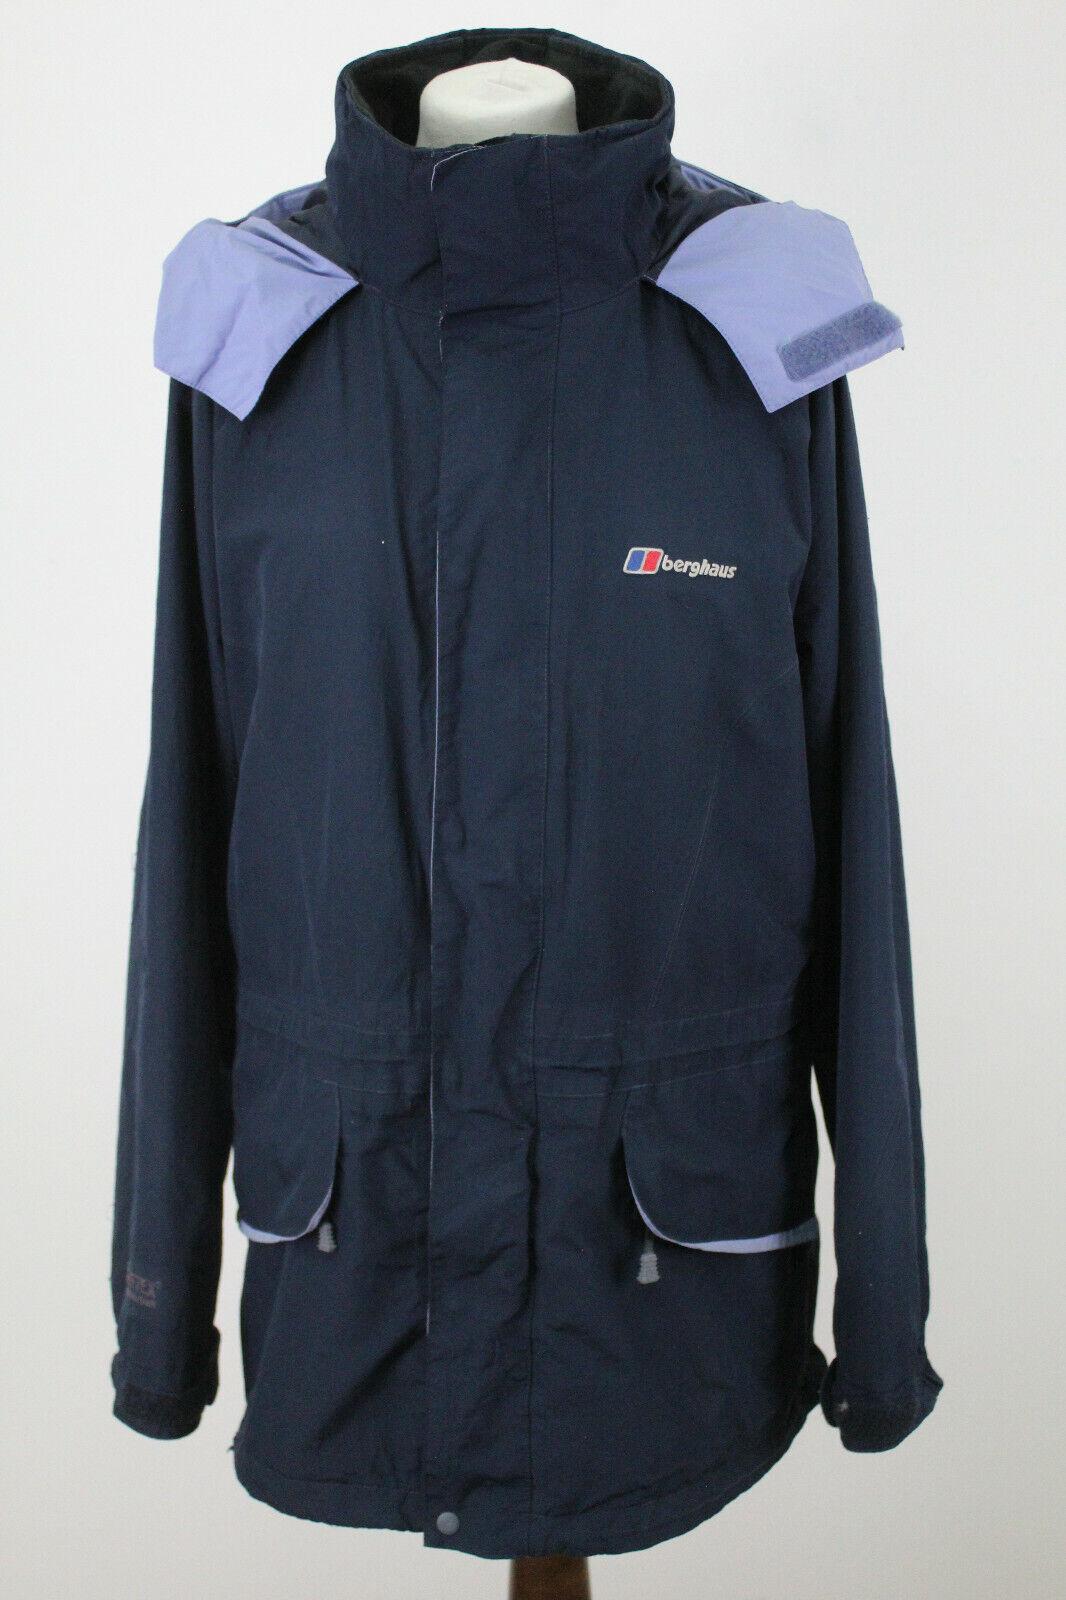 BERGHAUS Gore-Tex Navy Windbreaker Rain Jacket size Uk 16